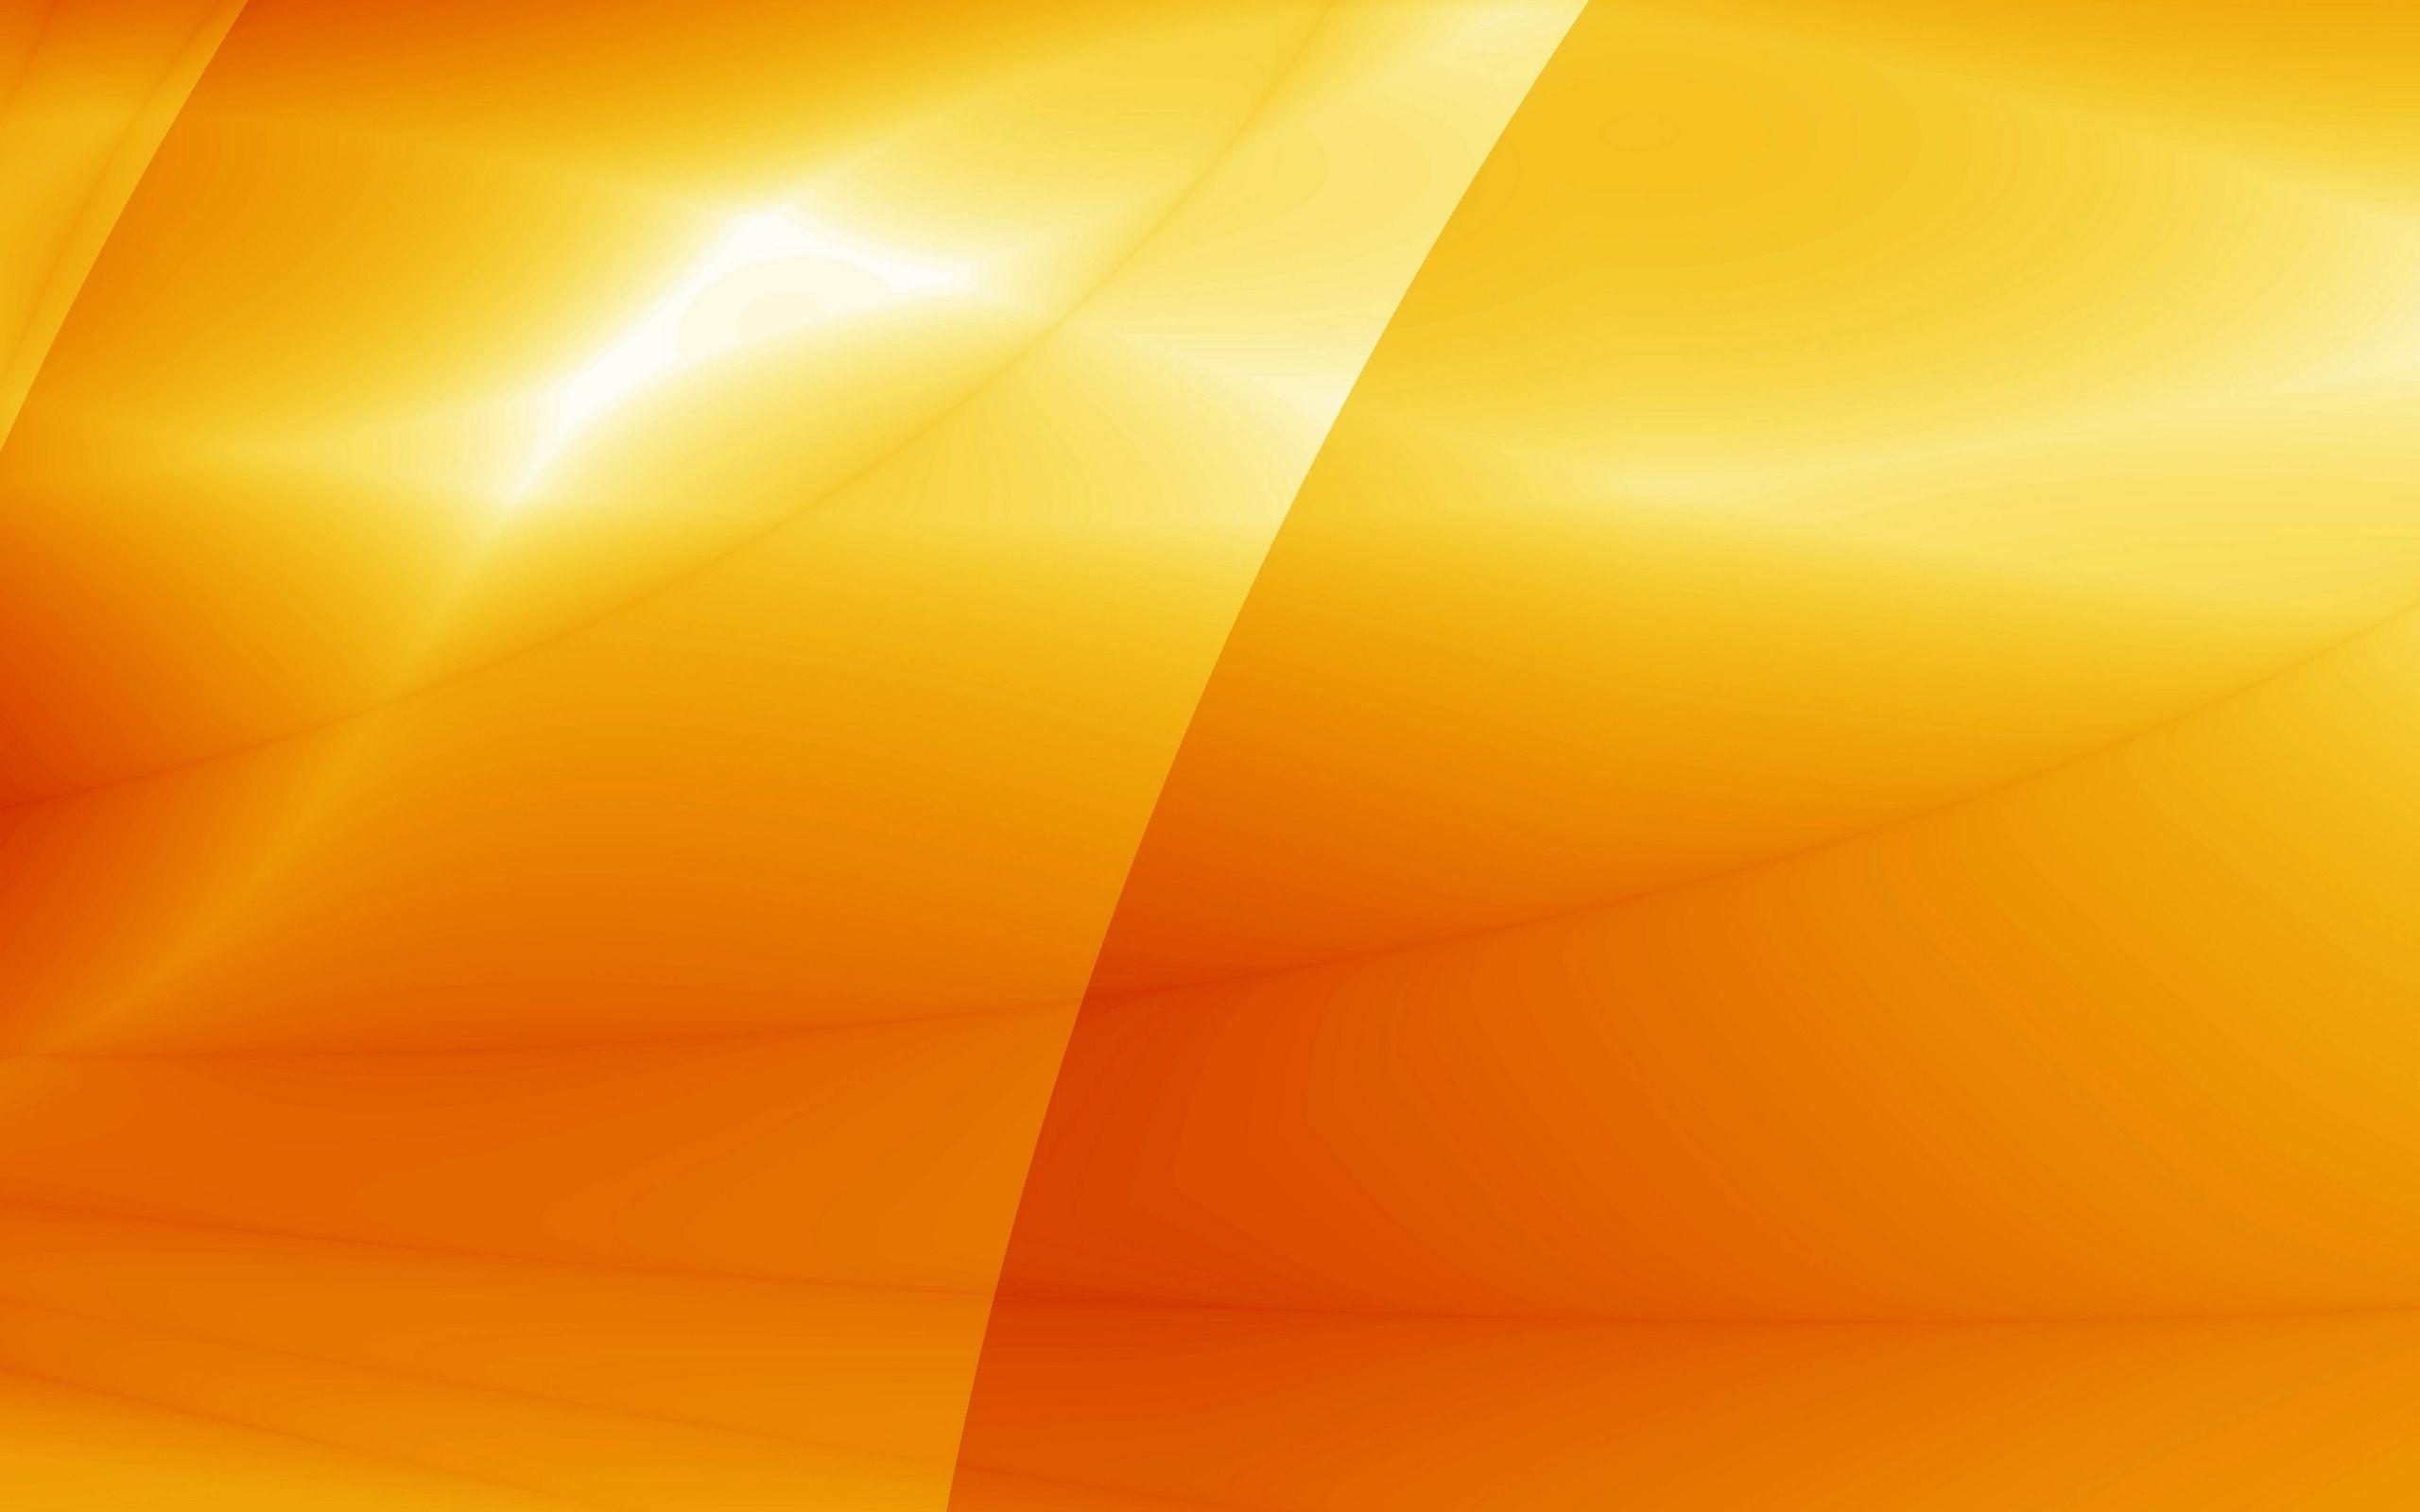 2560x1600px Orange and Yellow Wallpaper HD